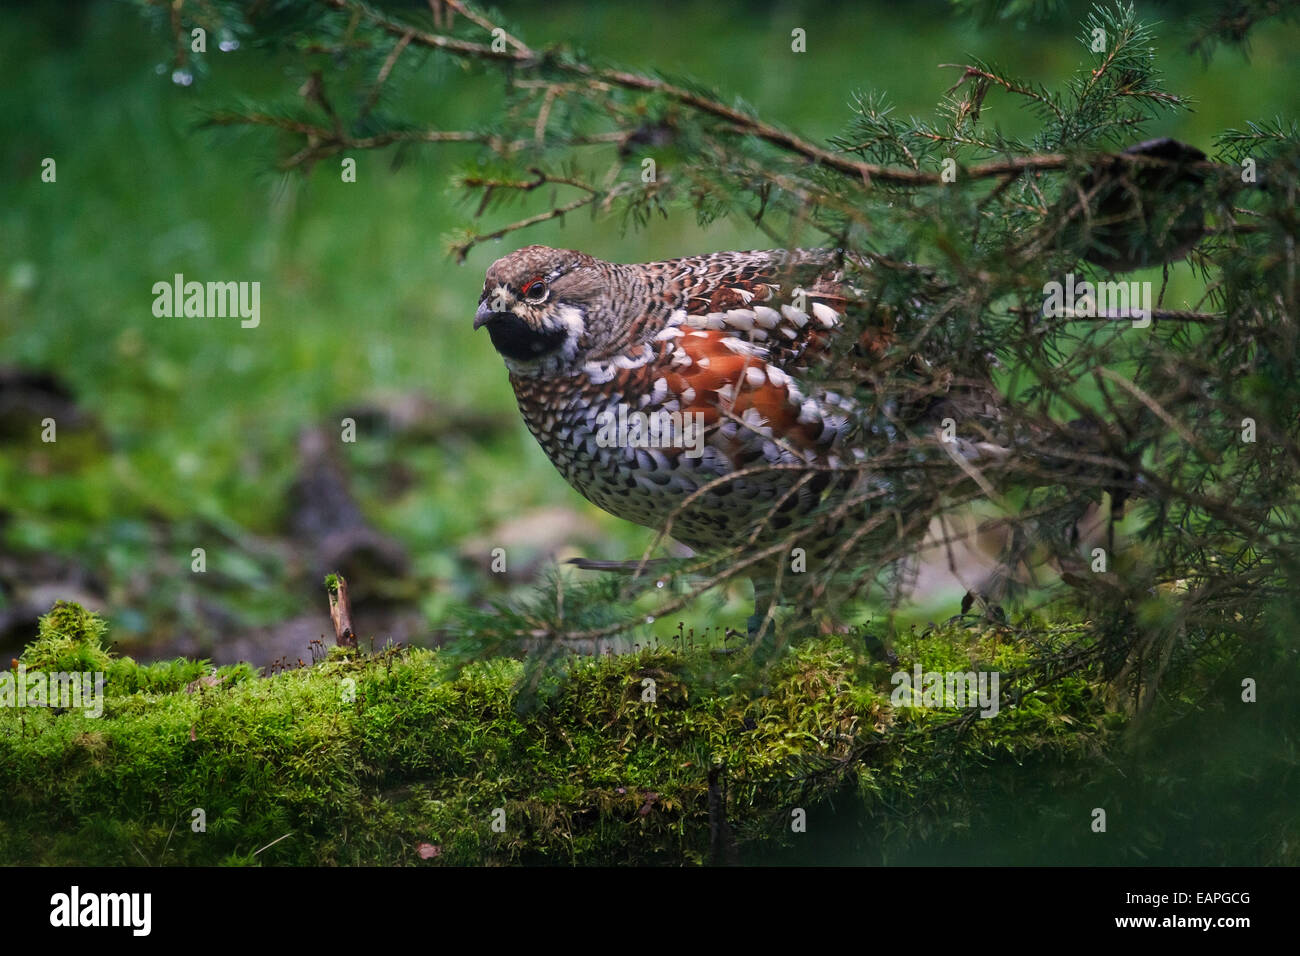 Hazel grouse / hazel hen (Tetrastes bonasia / Bonasa bonasia) male in forest - Stock Image